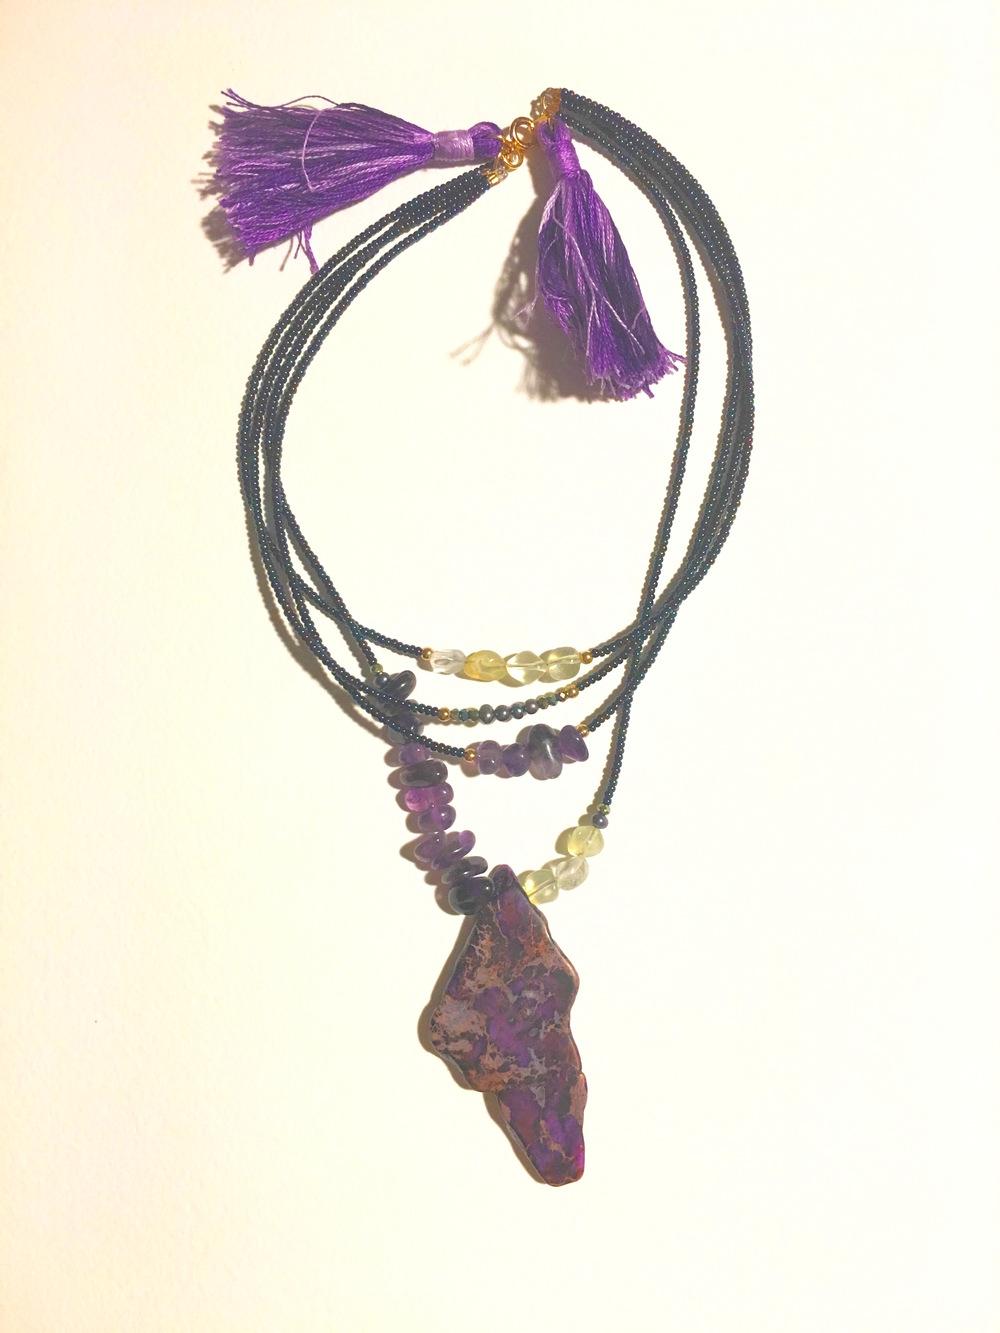 "Spirit of New Orleans  14"" Collar Necklace  Amethyst, Pineapple Quartz, Feldspar, Black Pearls, Gold, Crystal  $275"